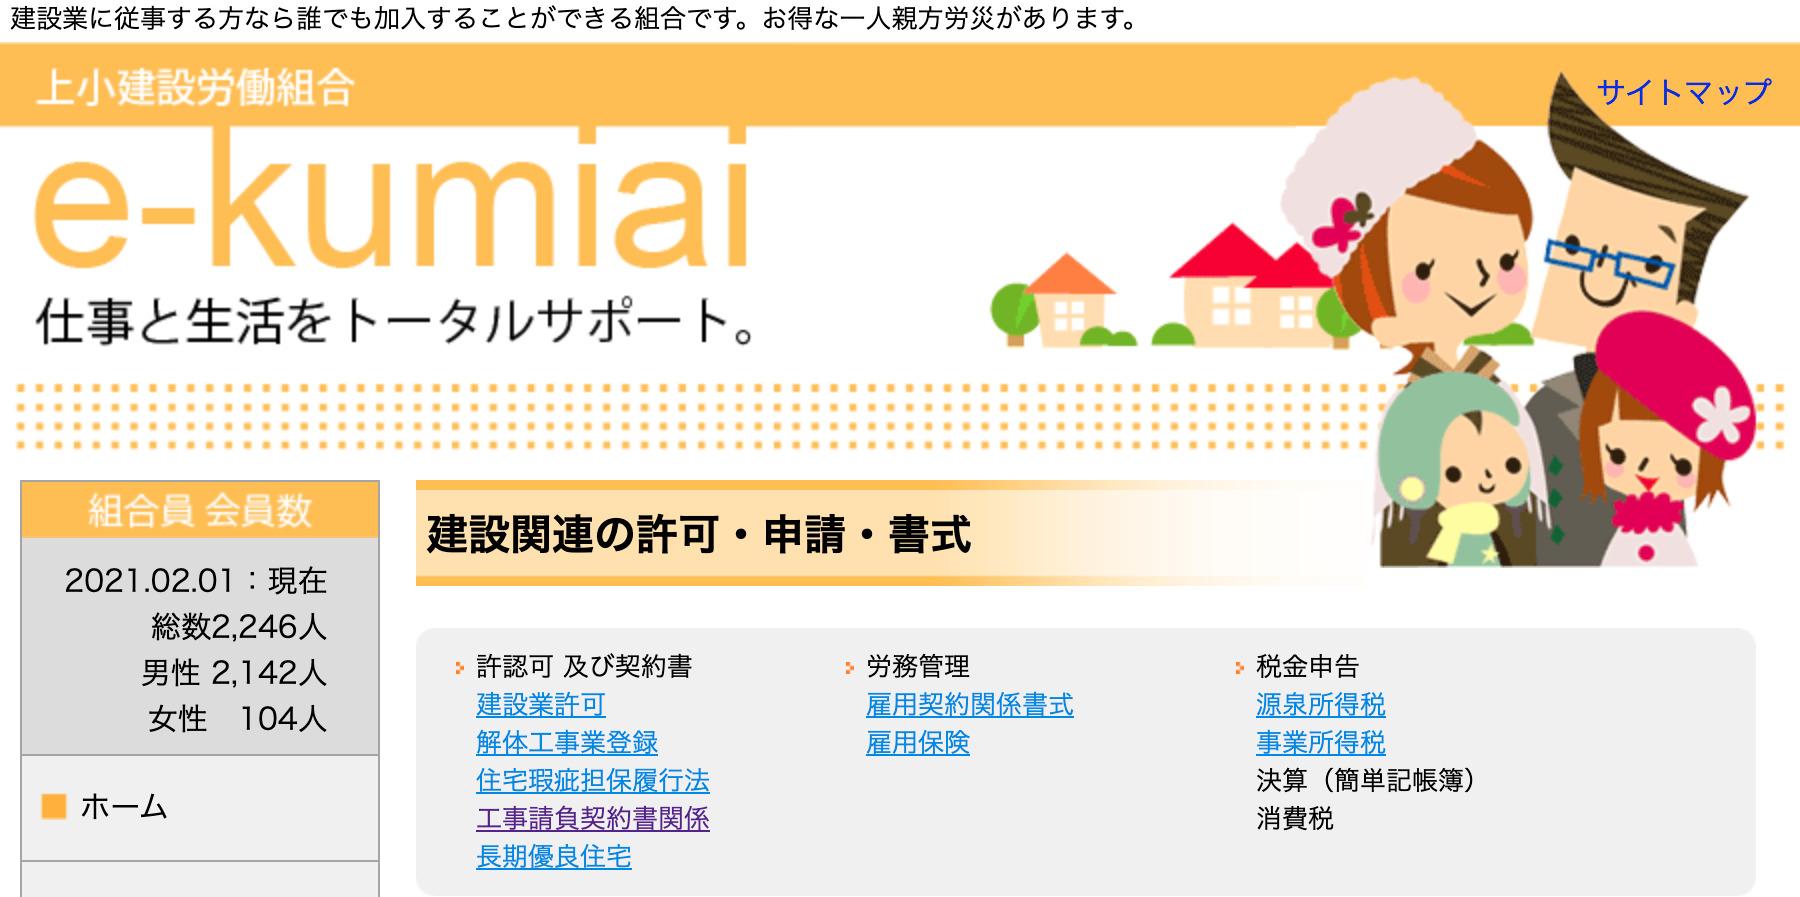 e-kumiai(上小建設労働組合)